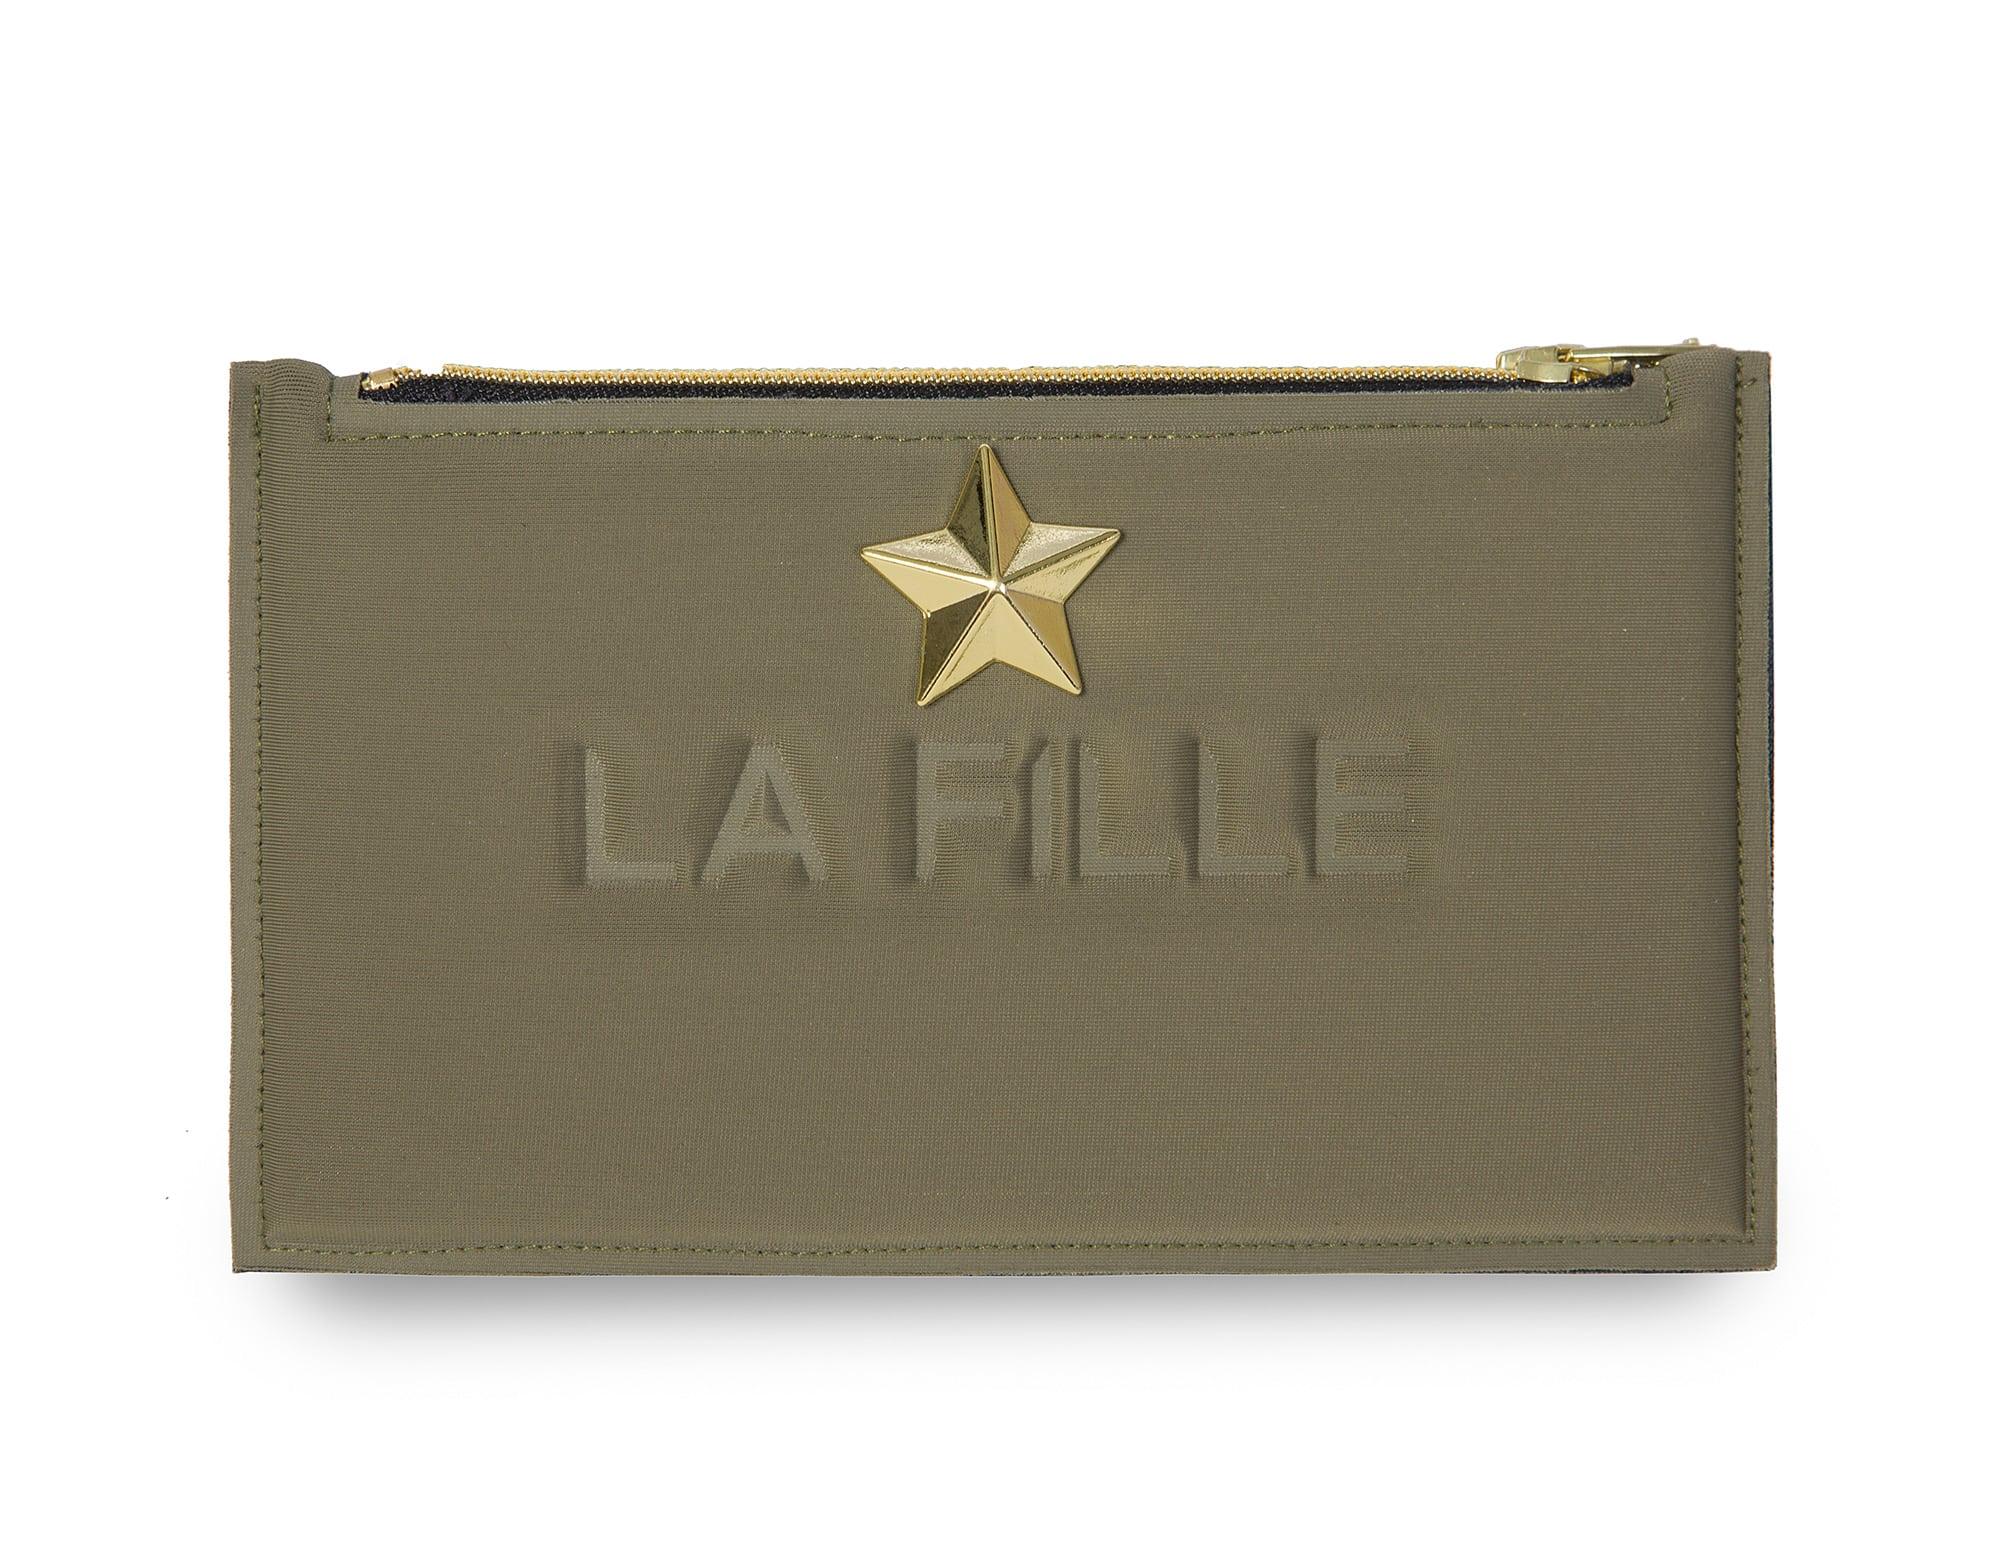 La Fille Des Fleurs La Fayette Kaki Cod.0409faykaki Arancione-  - ebay.it